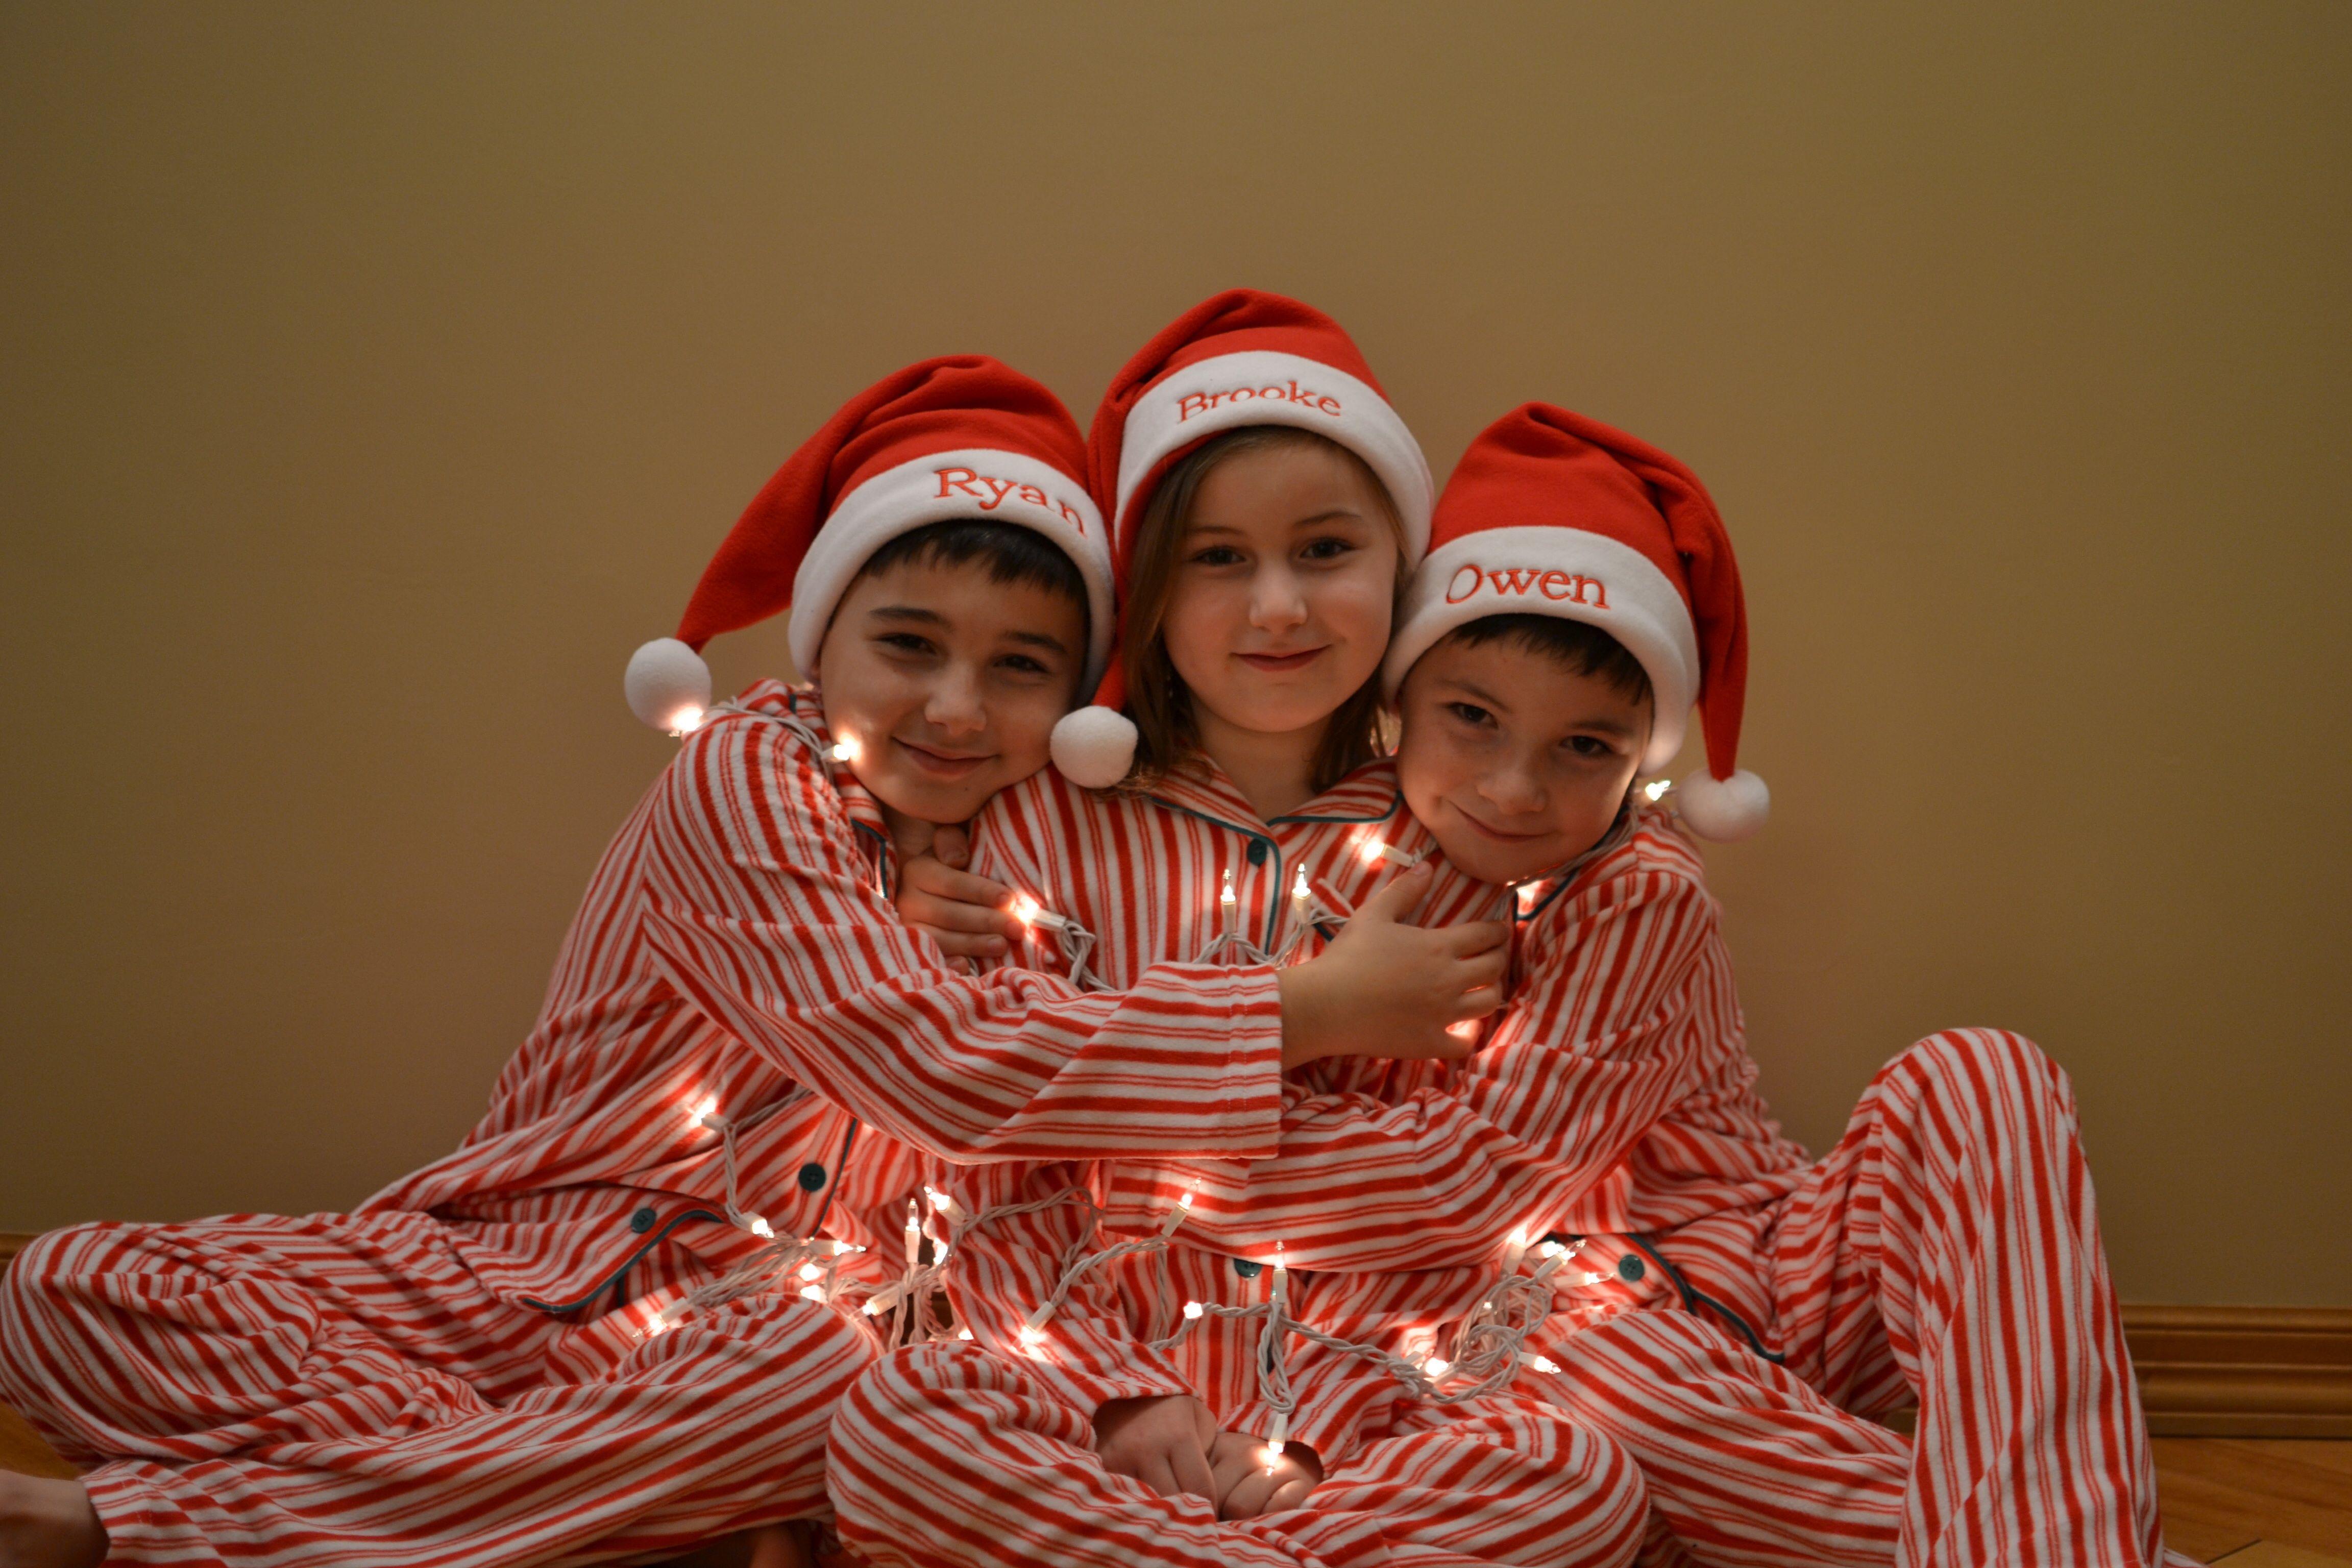 Candy Cane Fleece Matching Family Pajamas Matching Family Pajamas Family Pajamas Pajamas